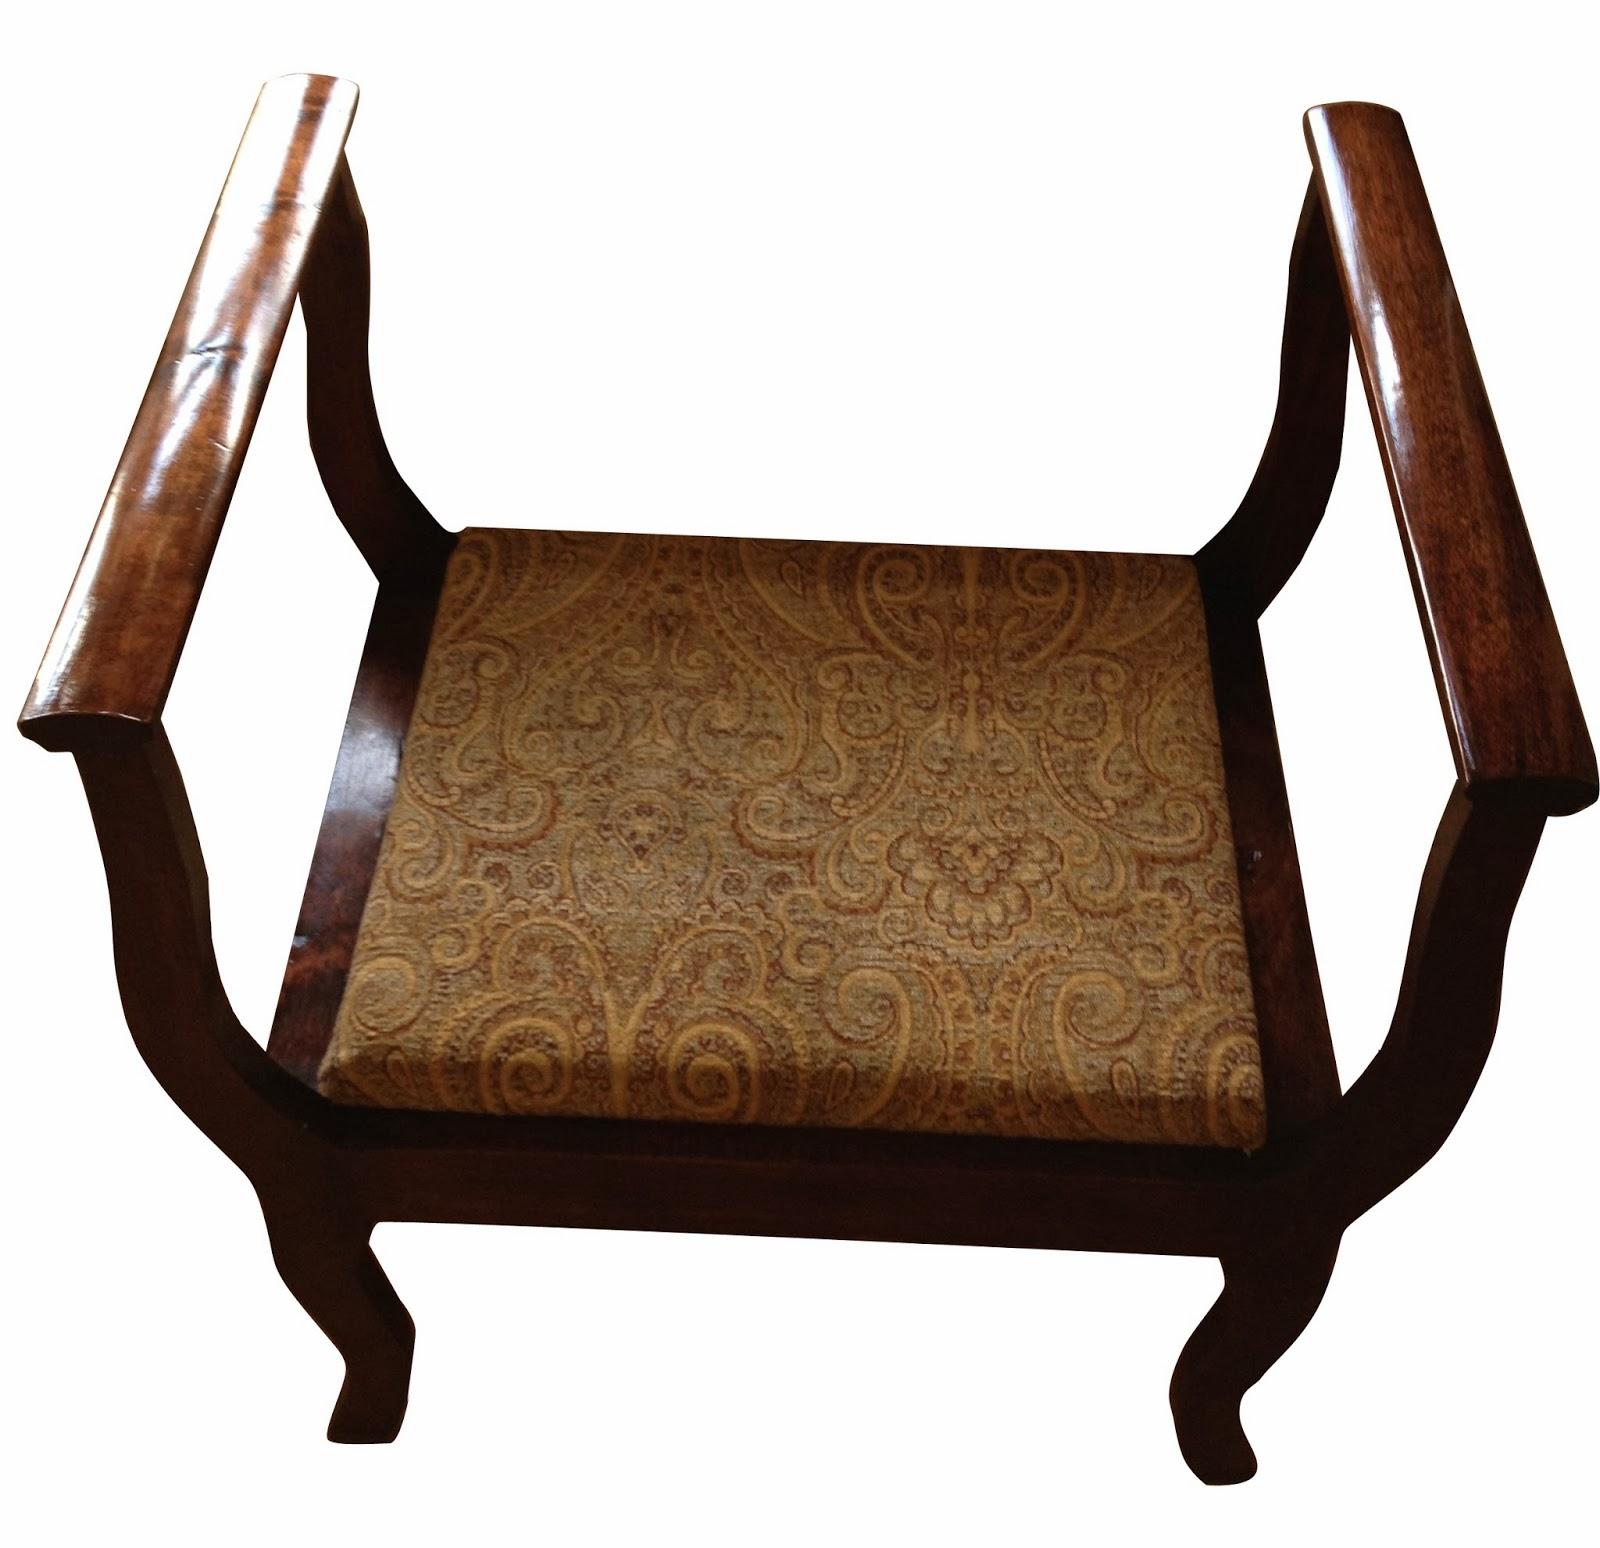 Finale Furniture Restoration Services, LLC: Antique Window Bench